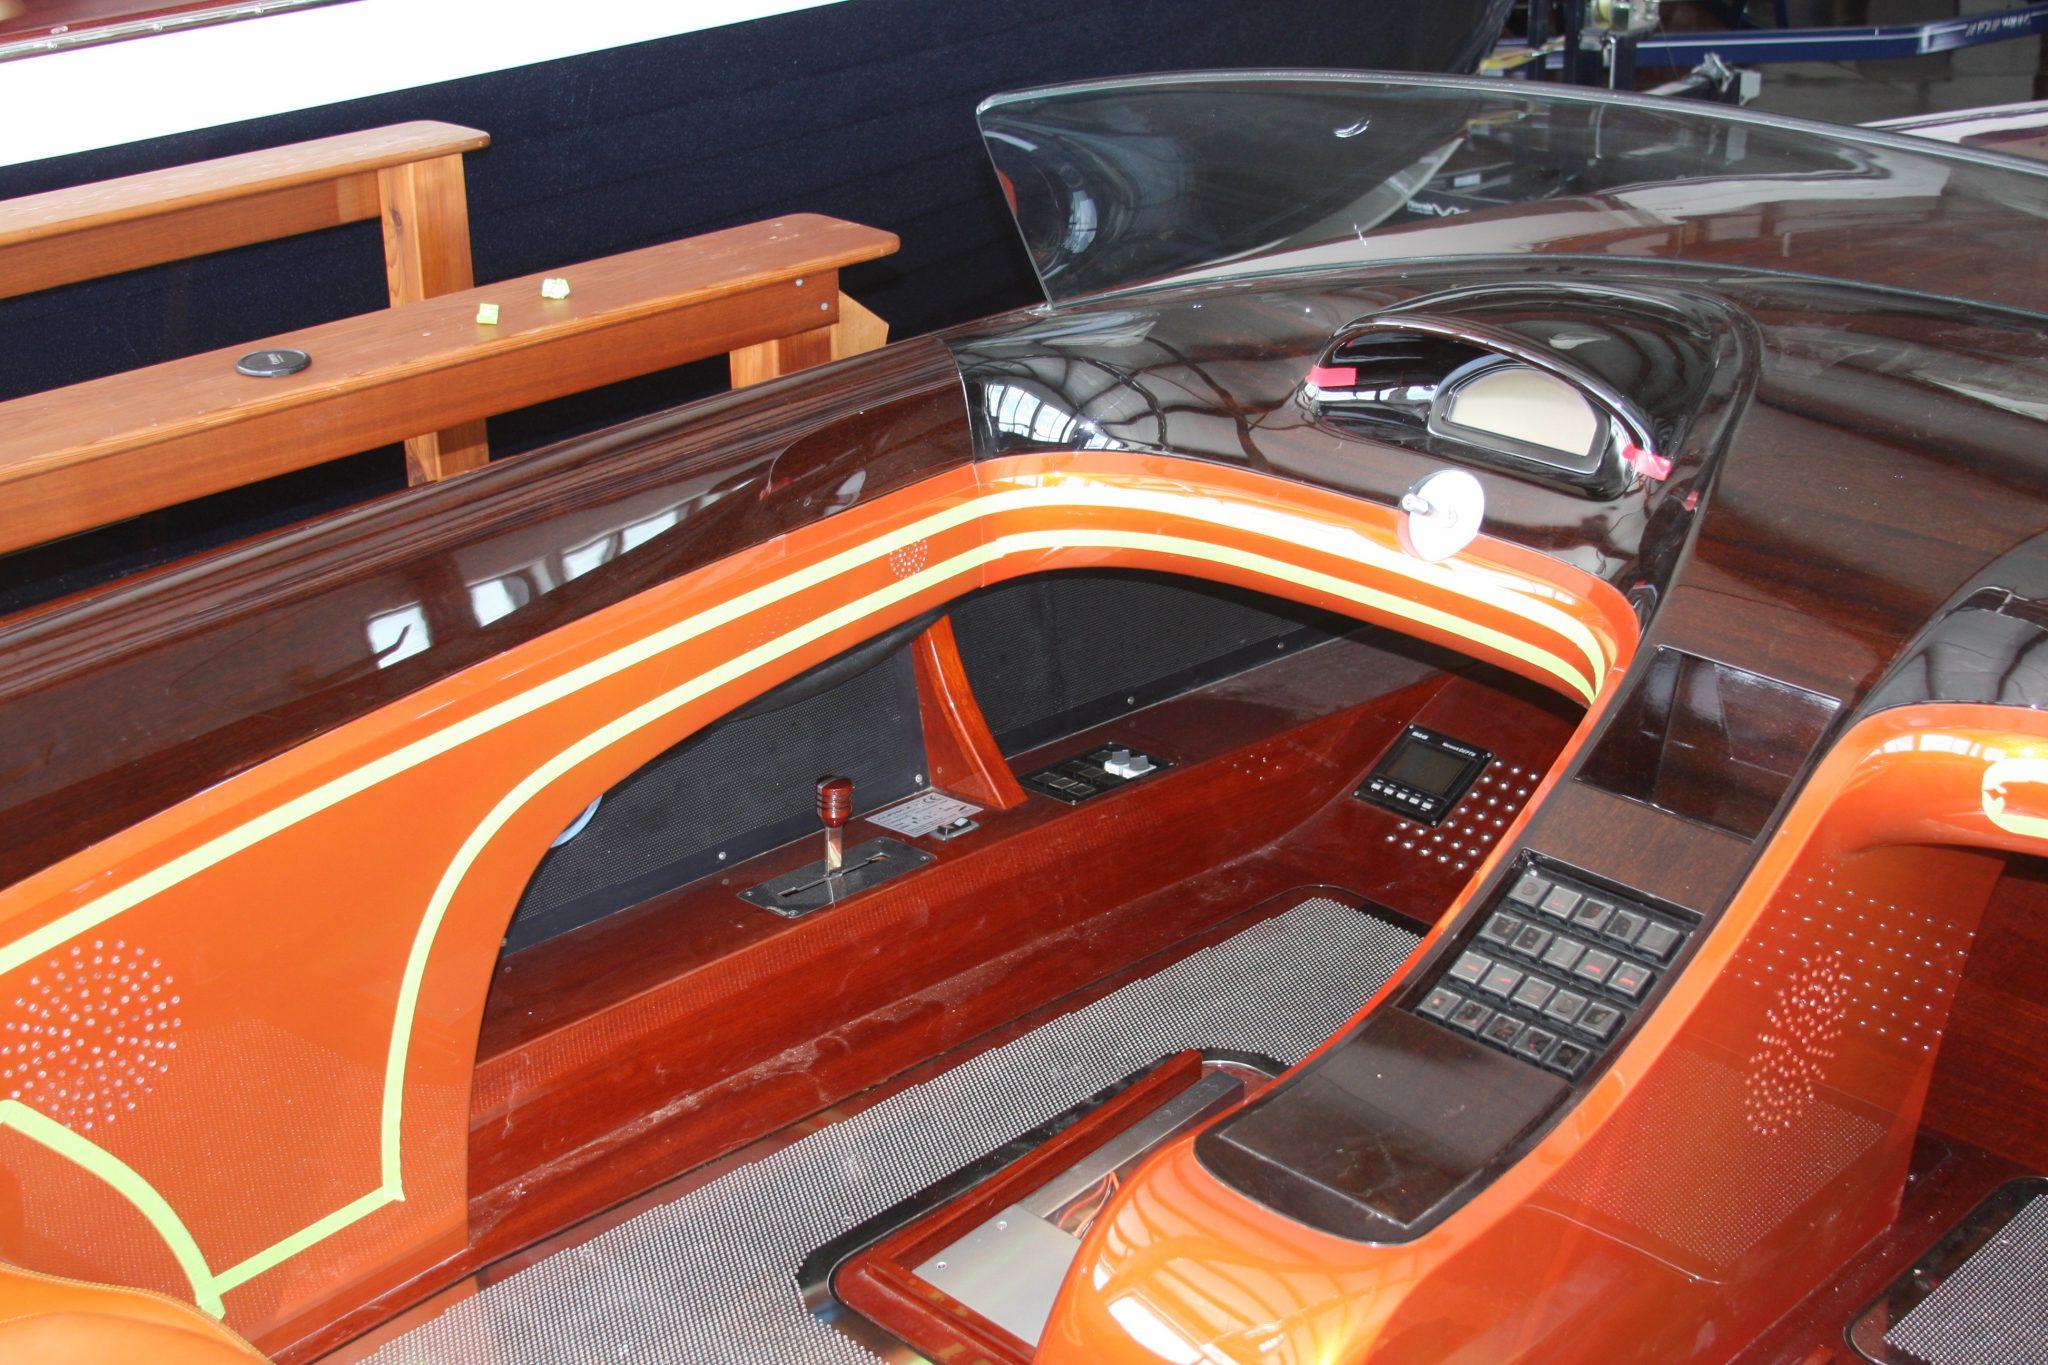 Carved mahogany dash of VZ